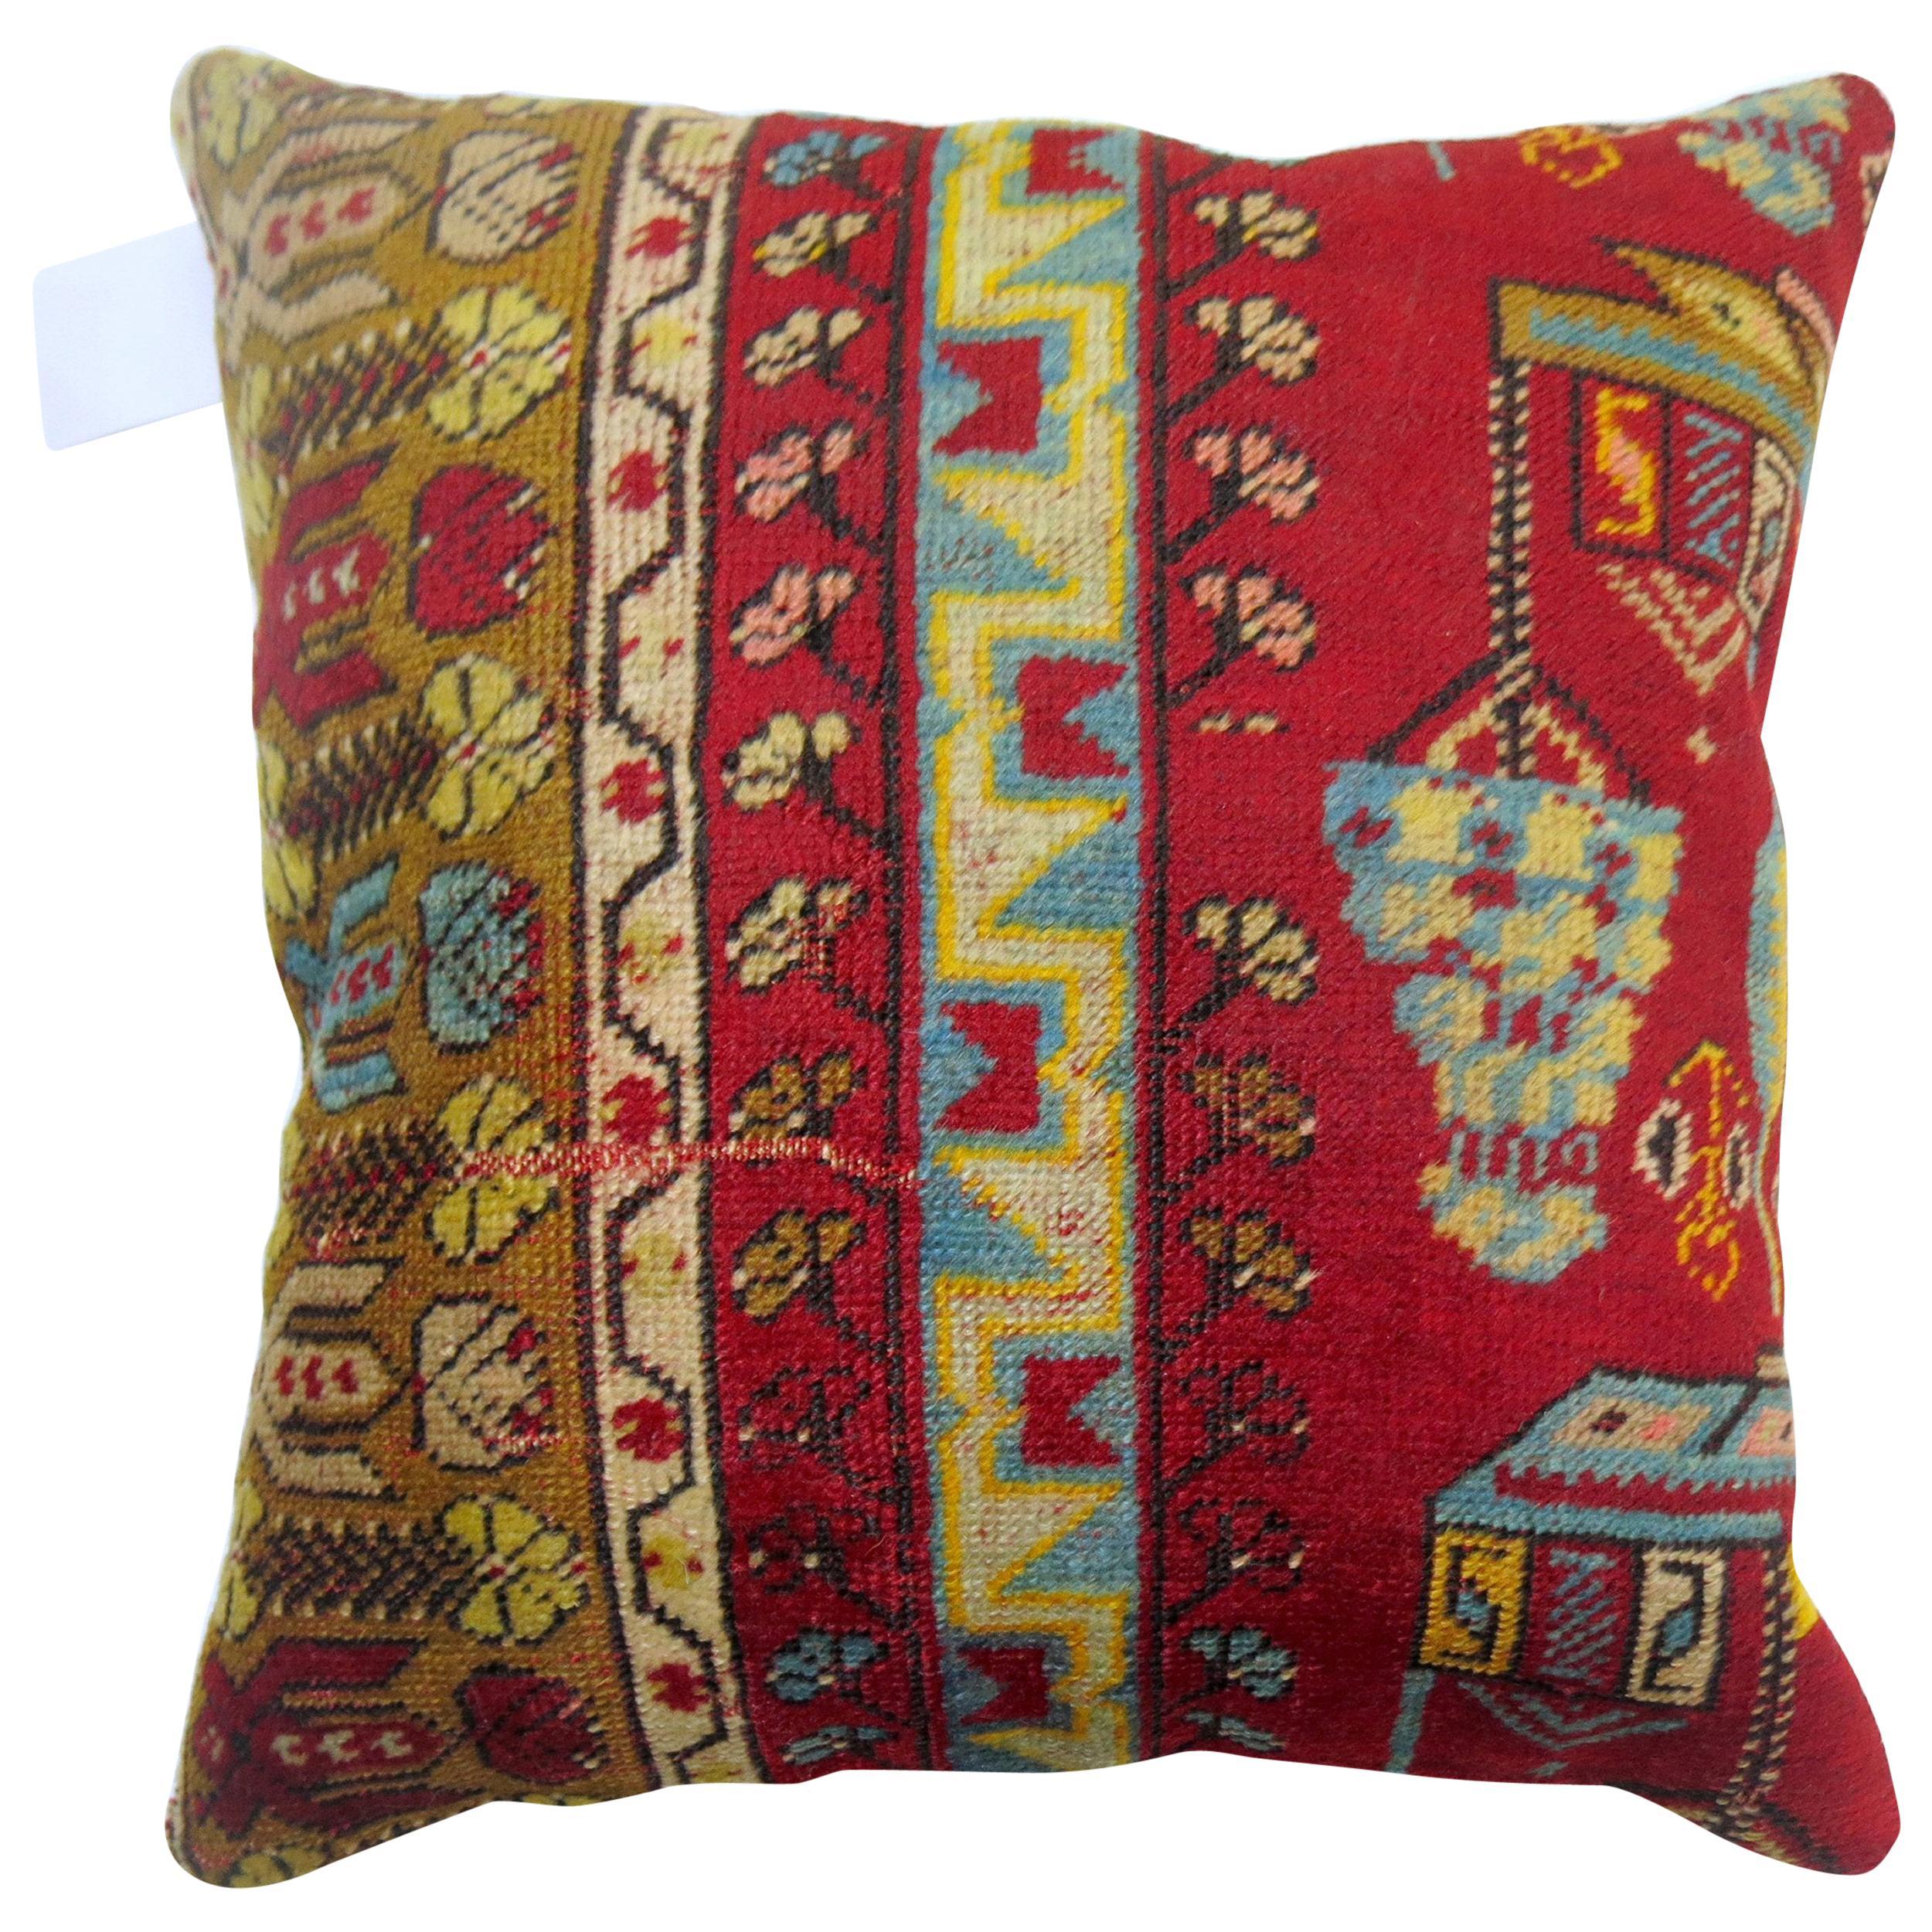 Bright Red Bohemian Turkish Rug Pillow